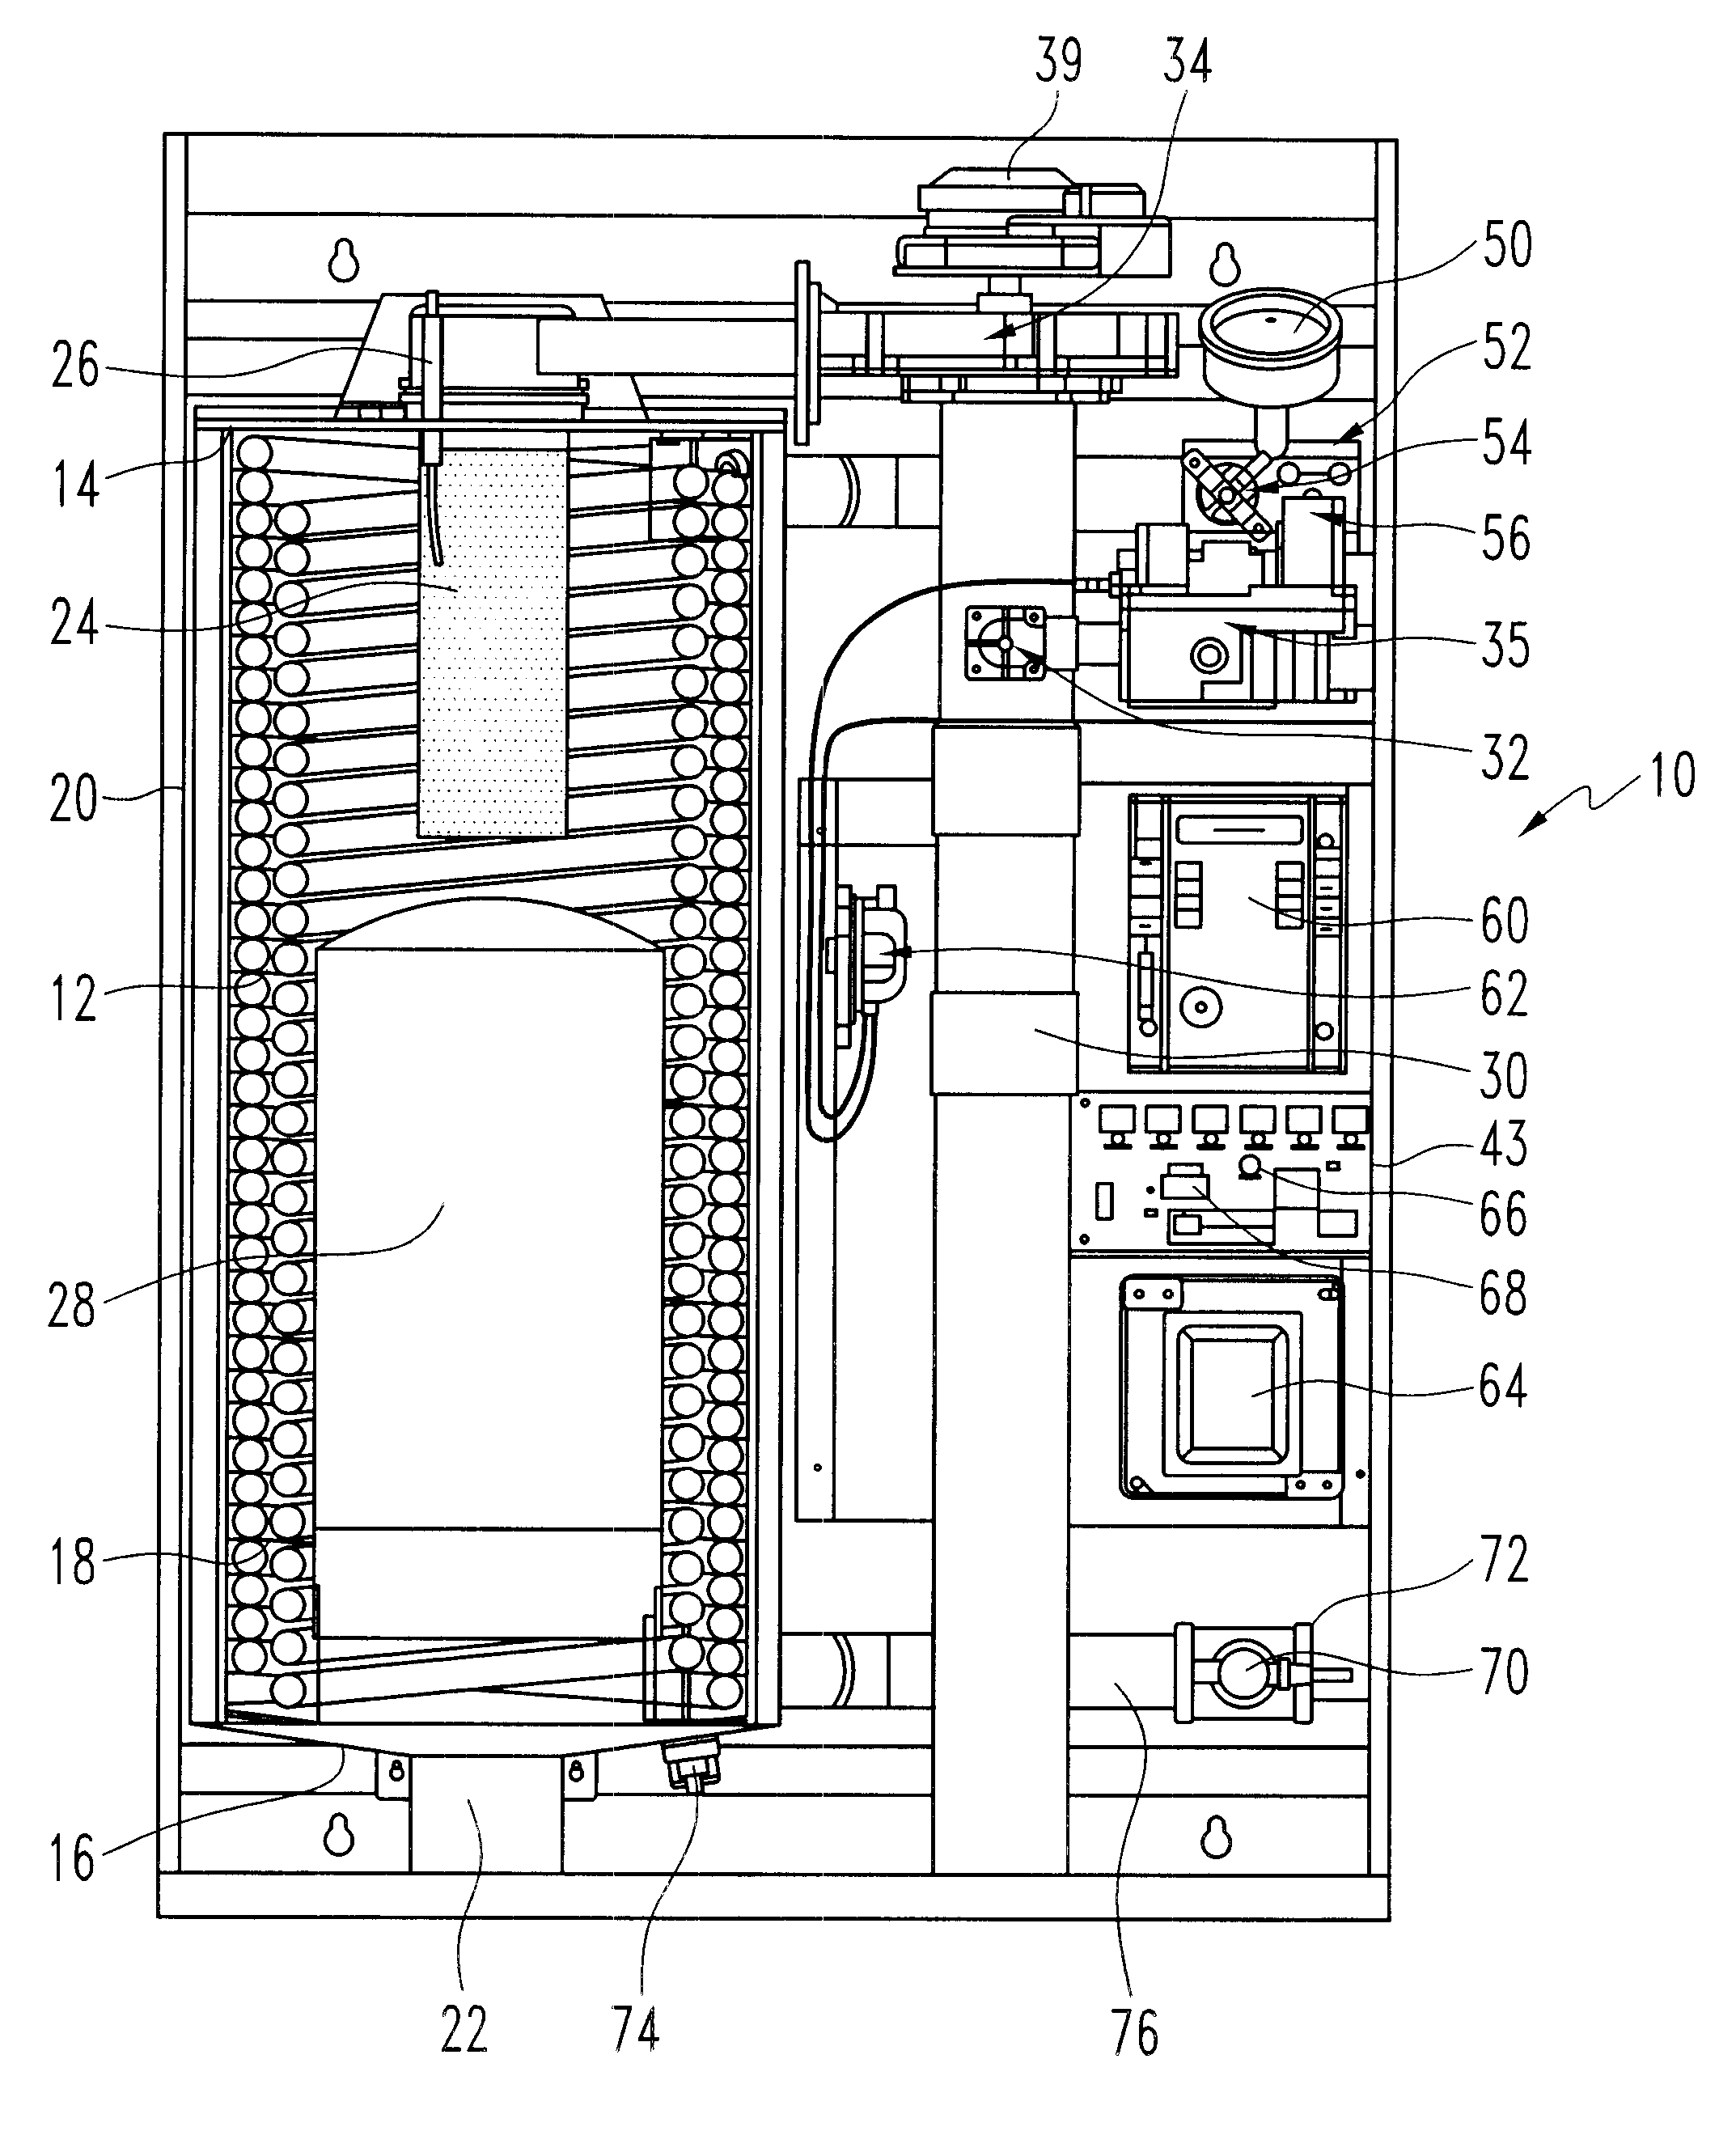 wiring gv90 boiler manual weilmclain gv90 user manual page low rh dbmovies us Home Boiler Wiring Boiler Control Wiring